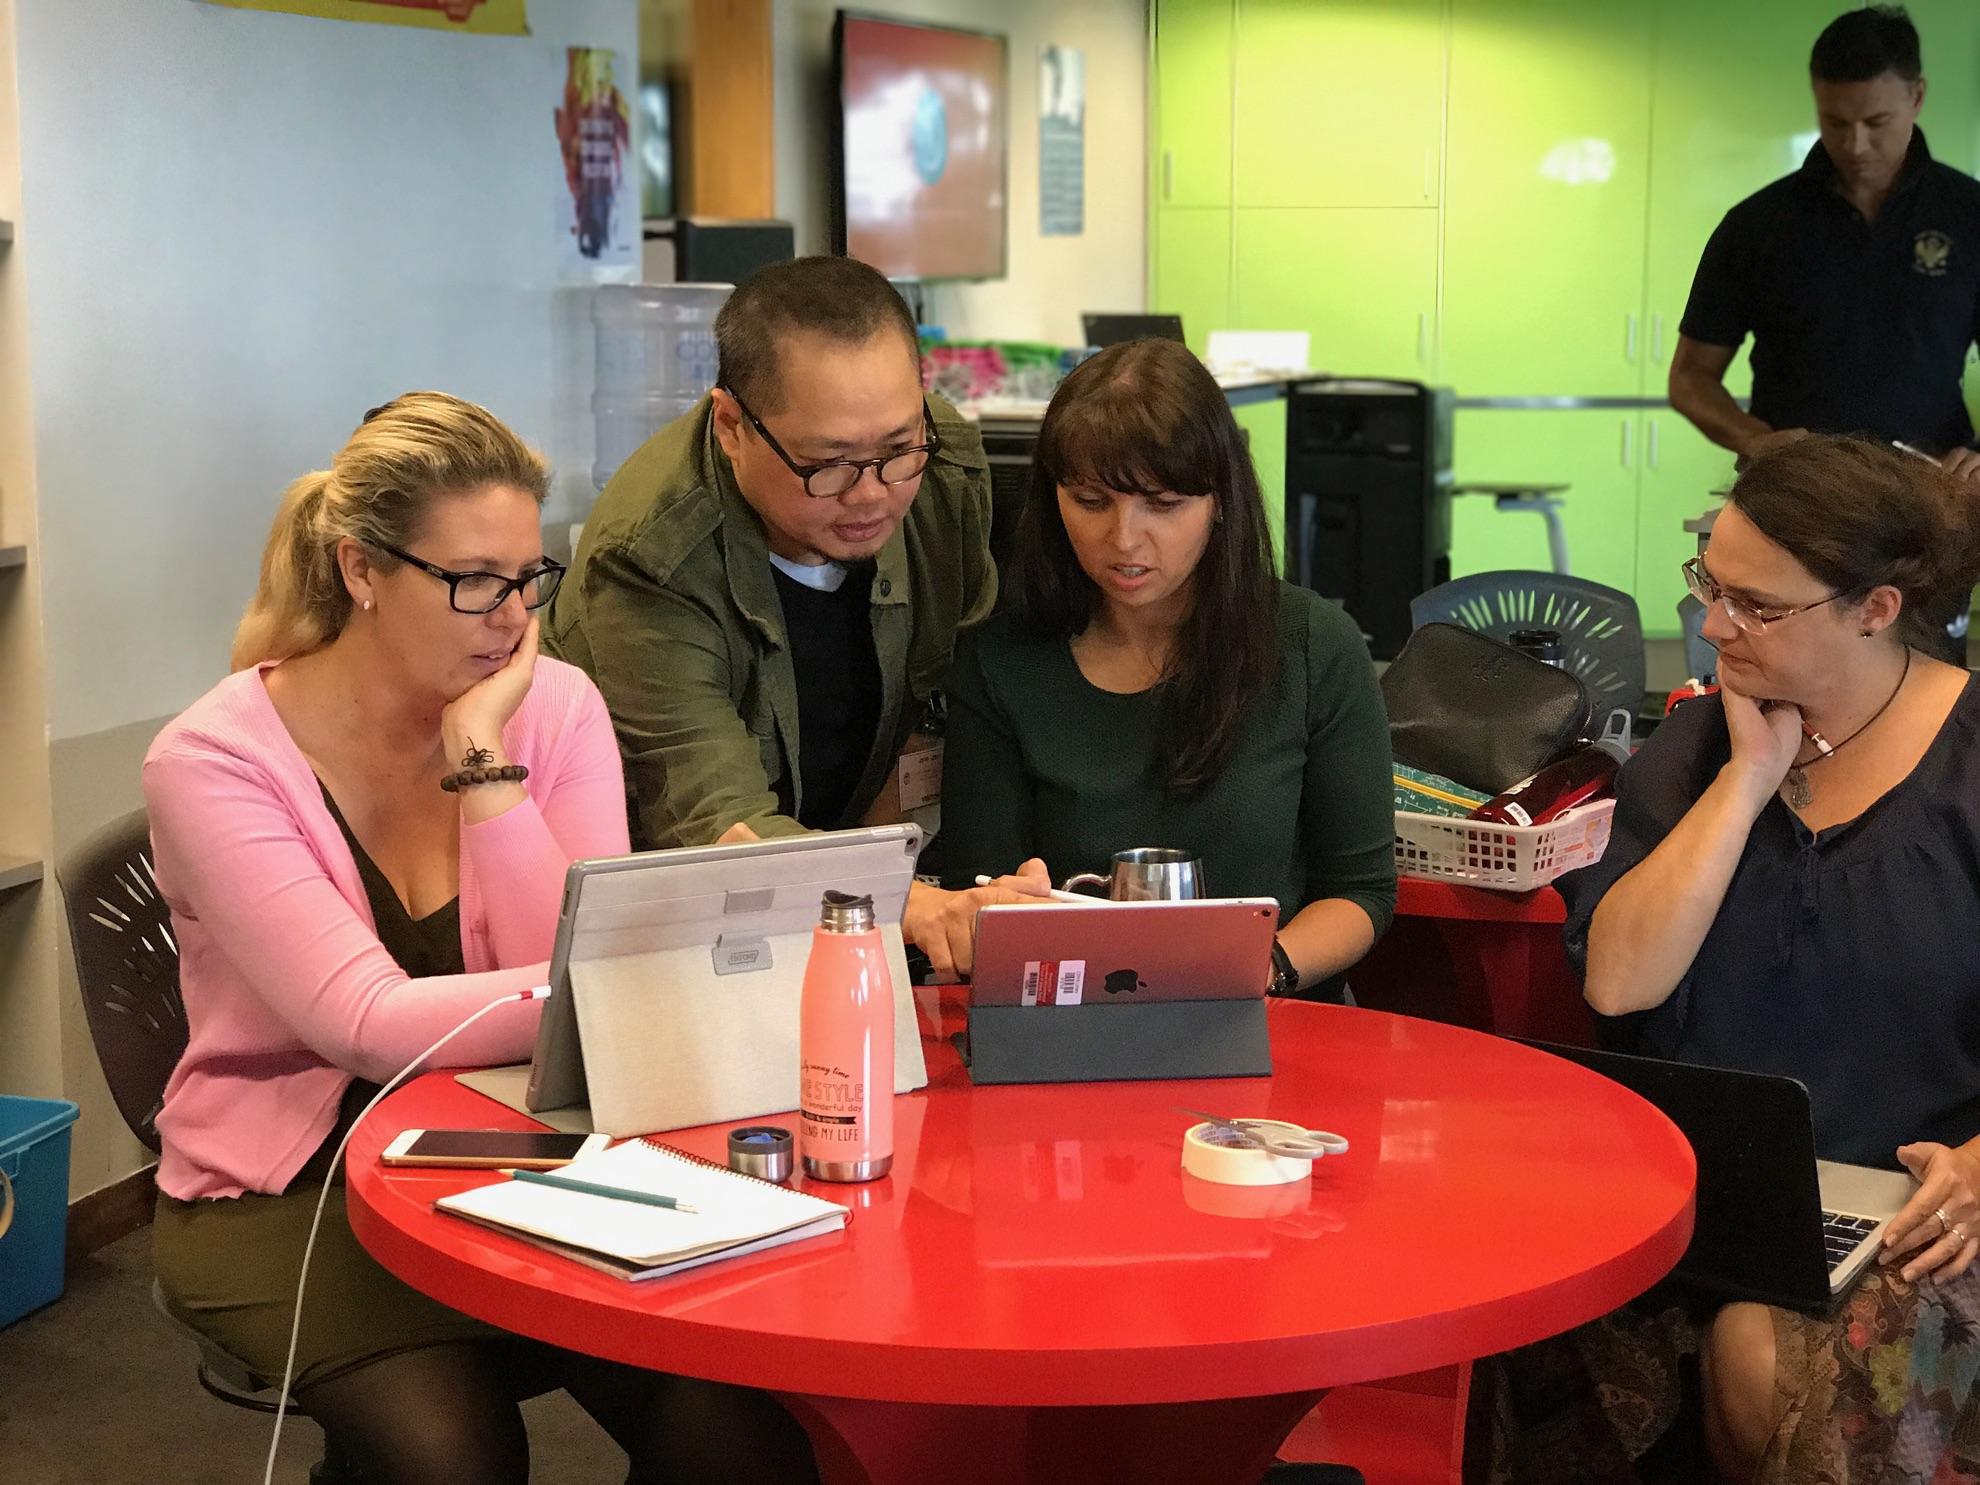 iPad Creative Workshops in schools